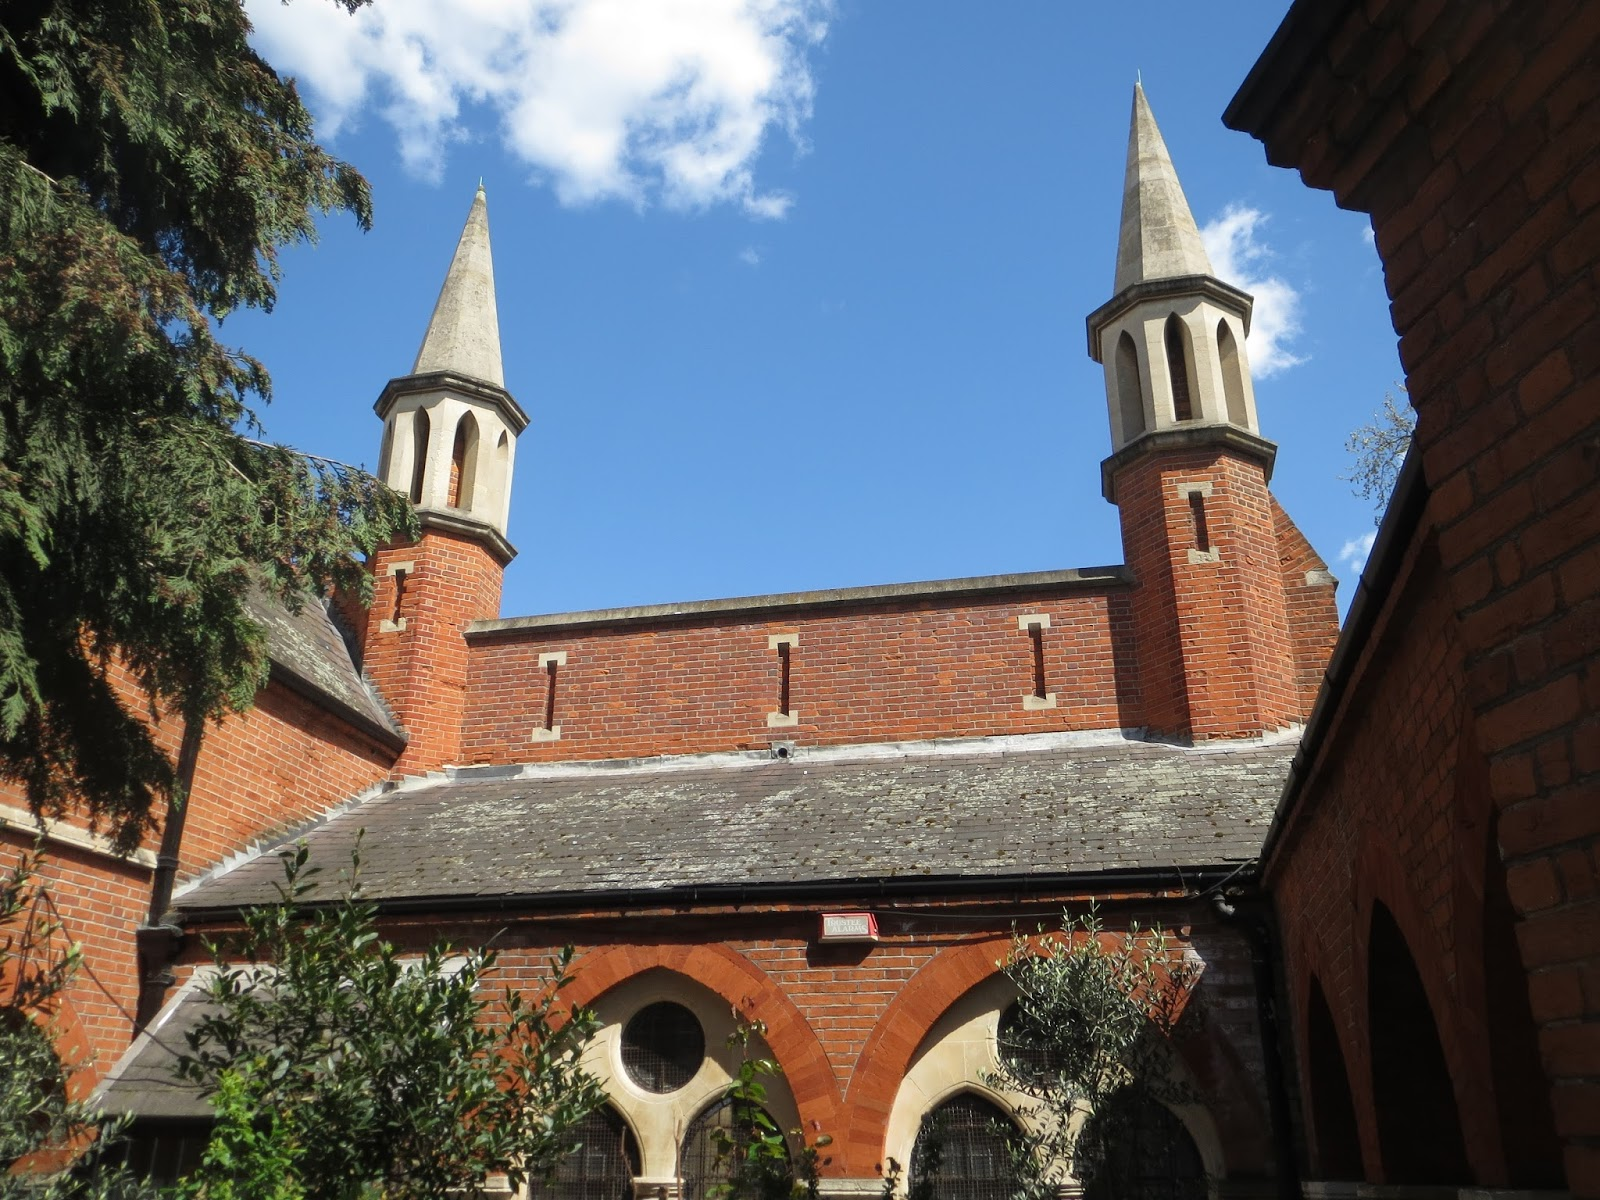 londinoupolis: St Mary's Greek Orthodox Cathedral